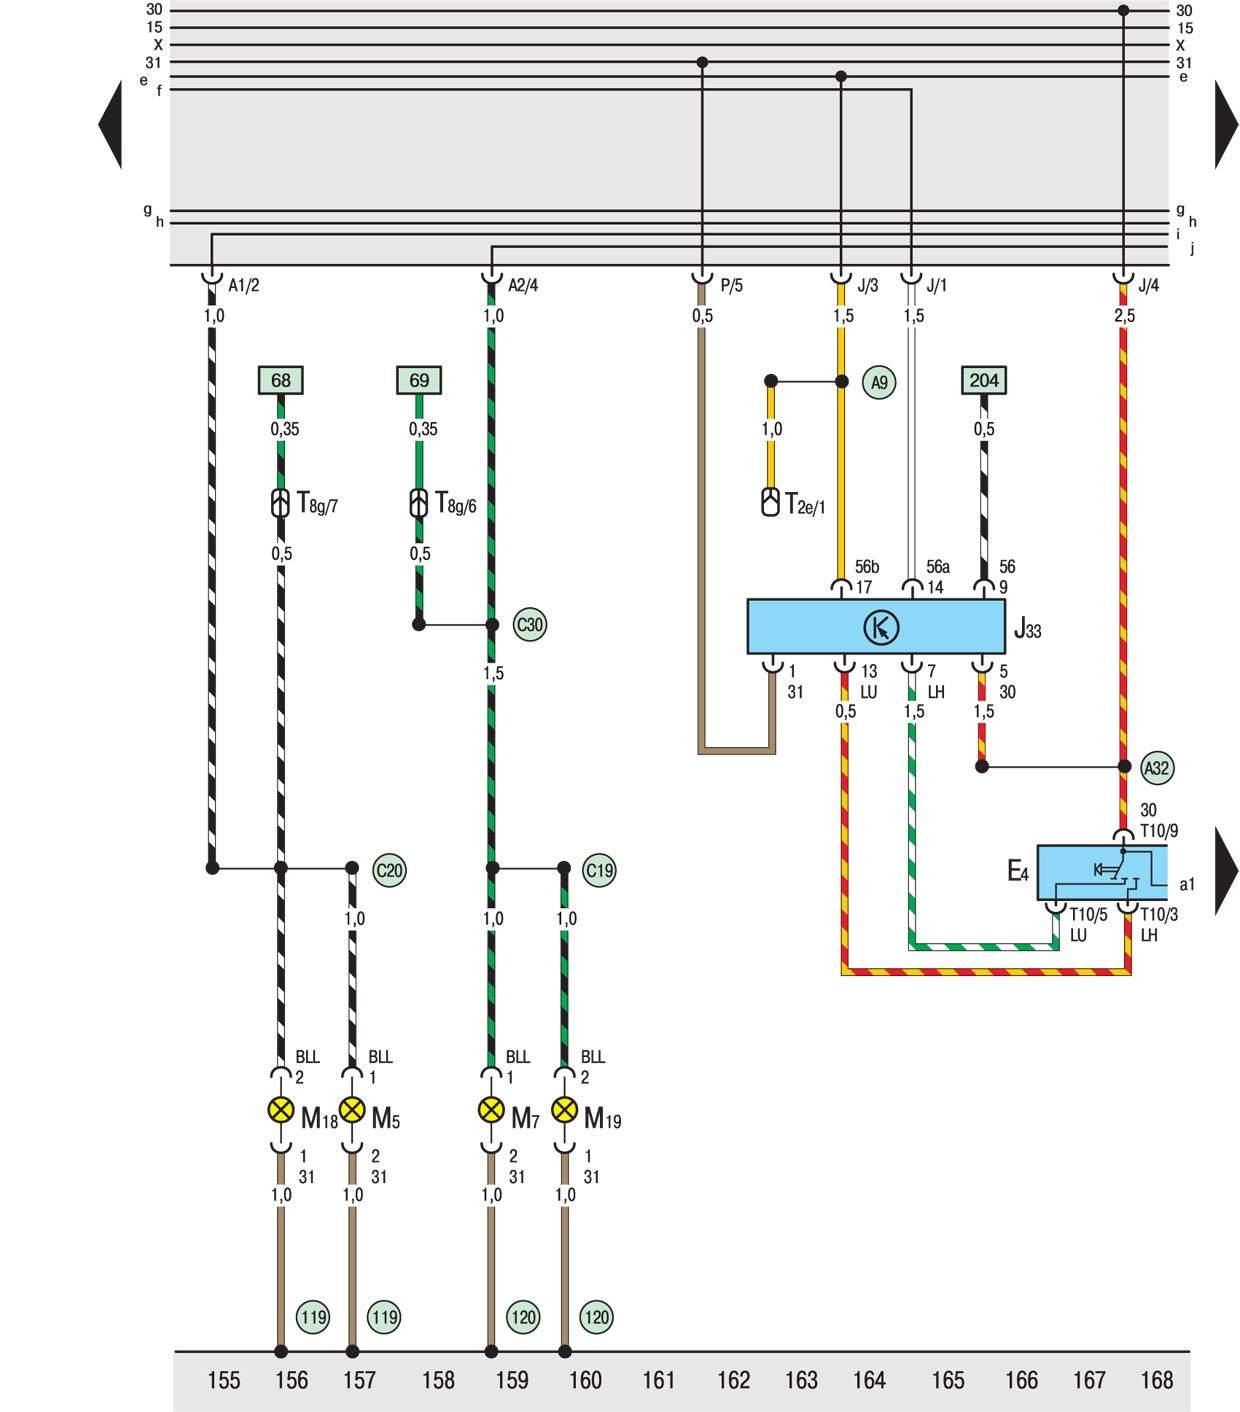 2015 Vw Sharan Wiring Audi Blog Volkswagen Diagram Used Genuine Engine Clutch Stevens Spares